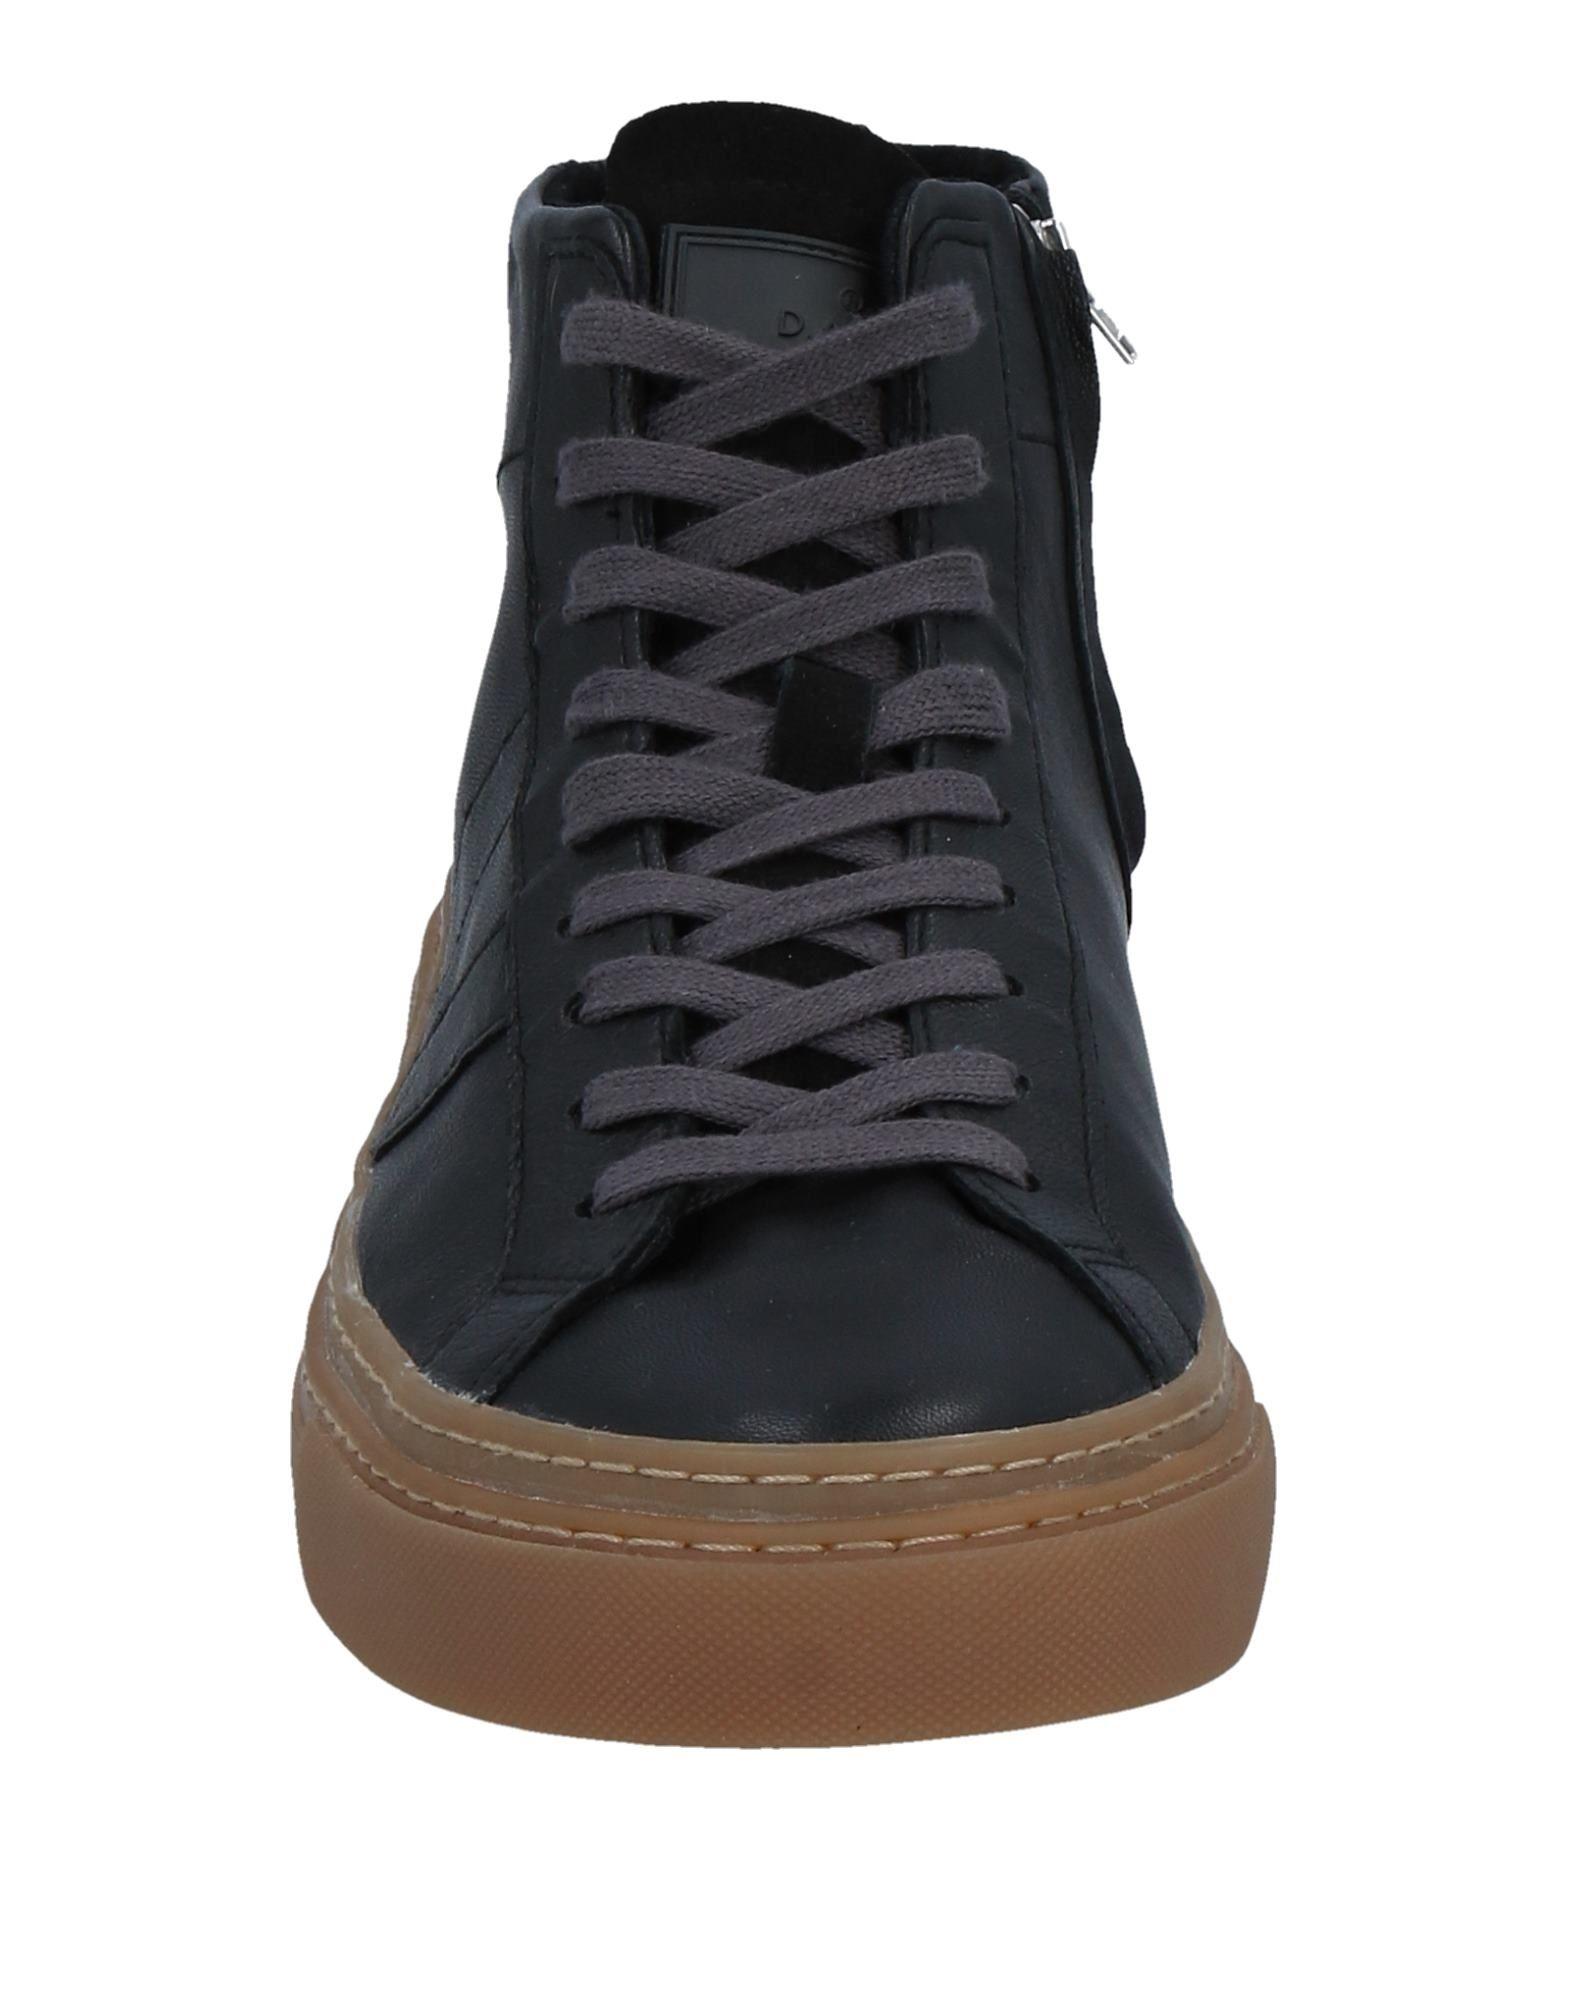 Rabatt Herren echte Schuhe D.A.T.E. Turnschuhes Herren Rabatt 11510382FC 6031cc